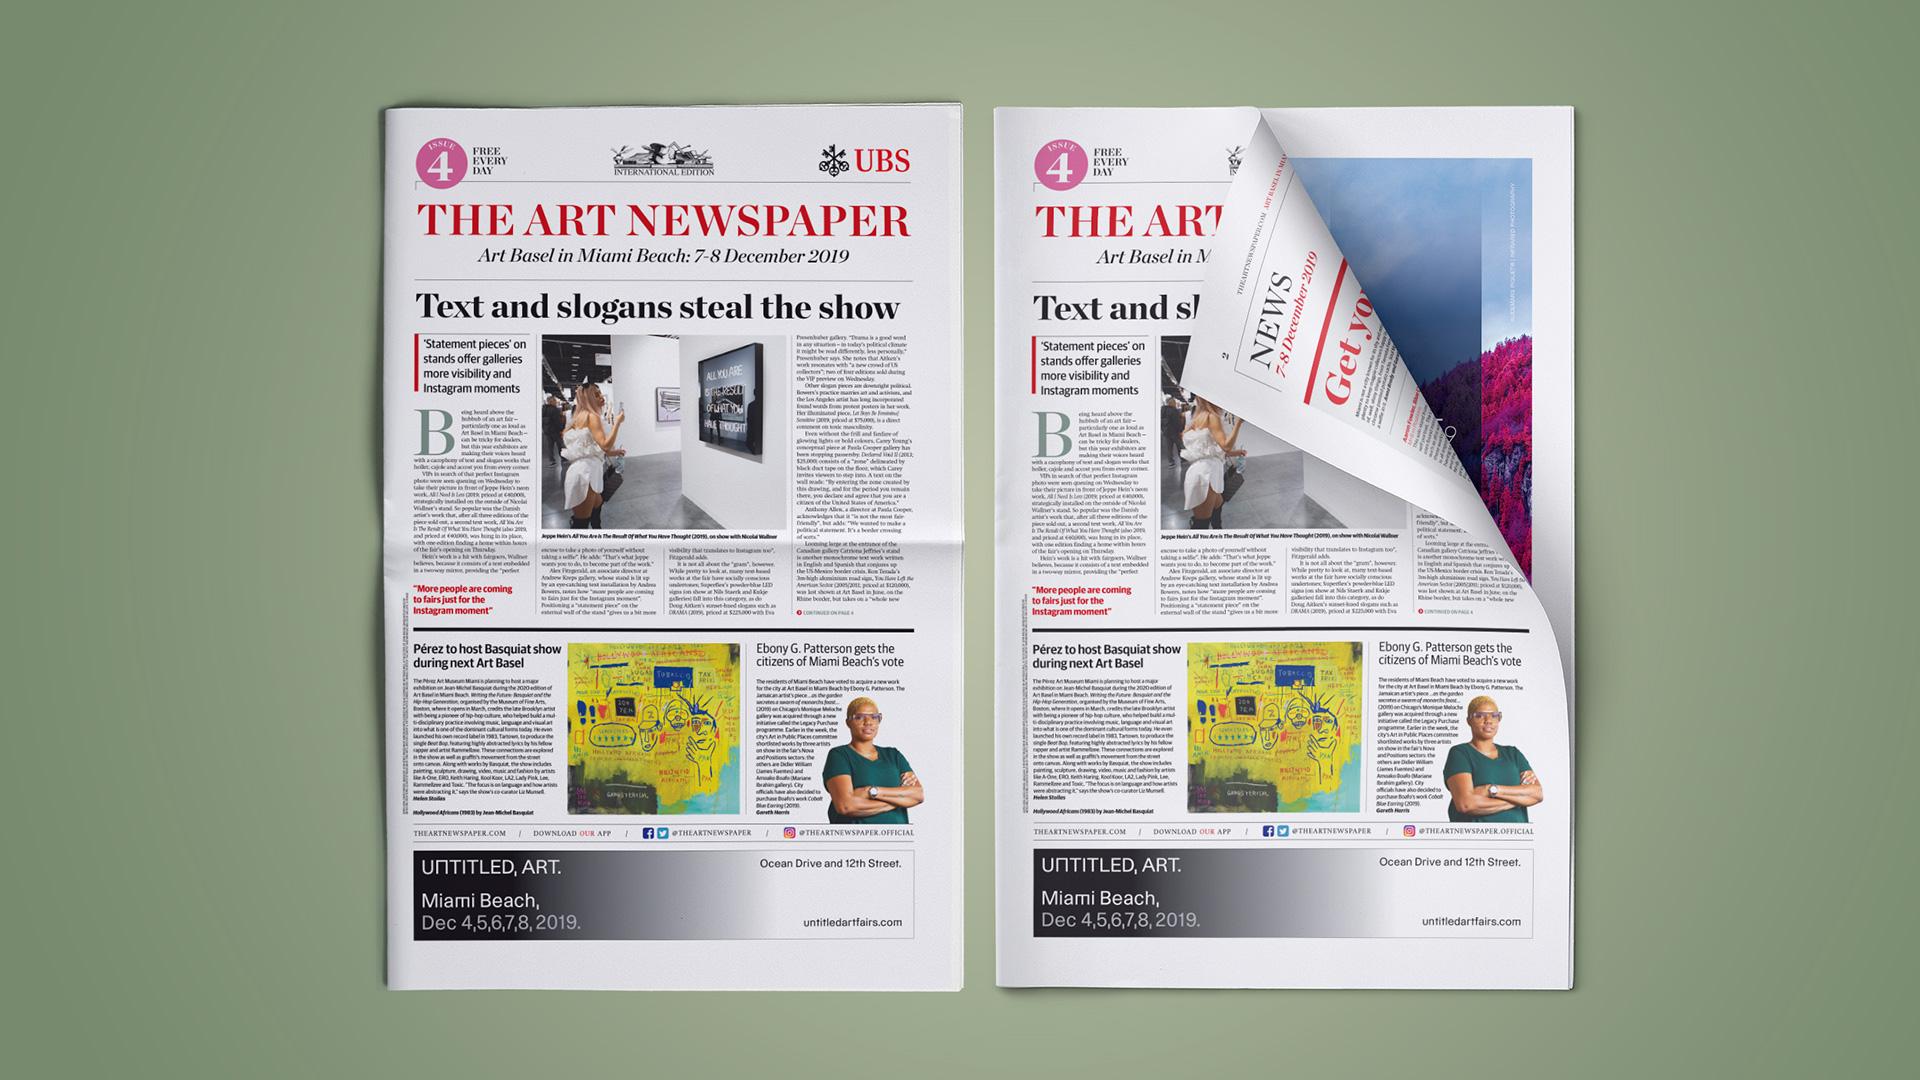 TAN-Newspaper-ABMB-cover-2500x1875px